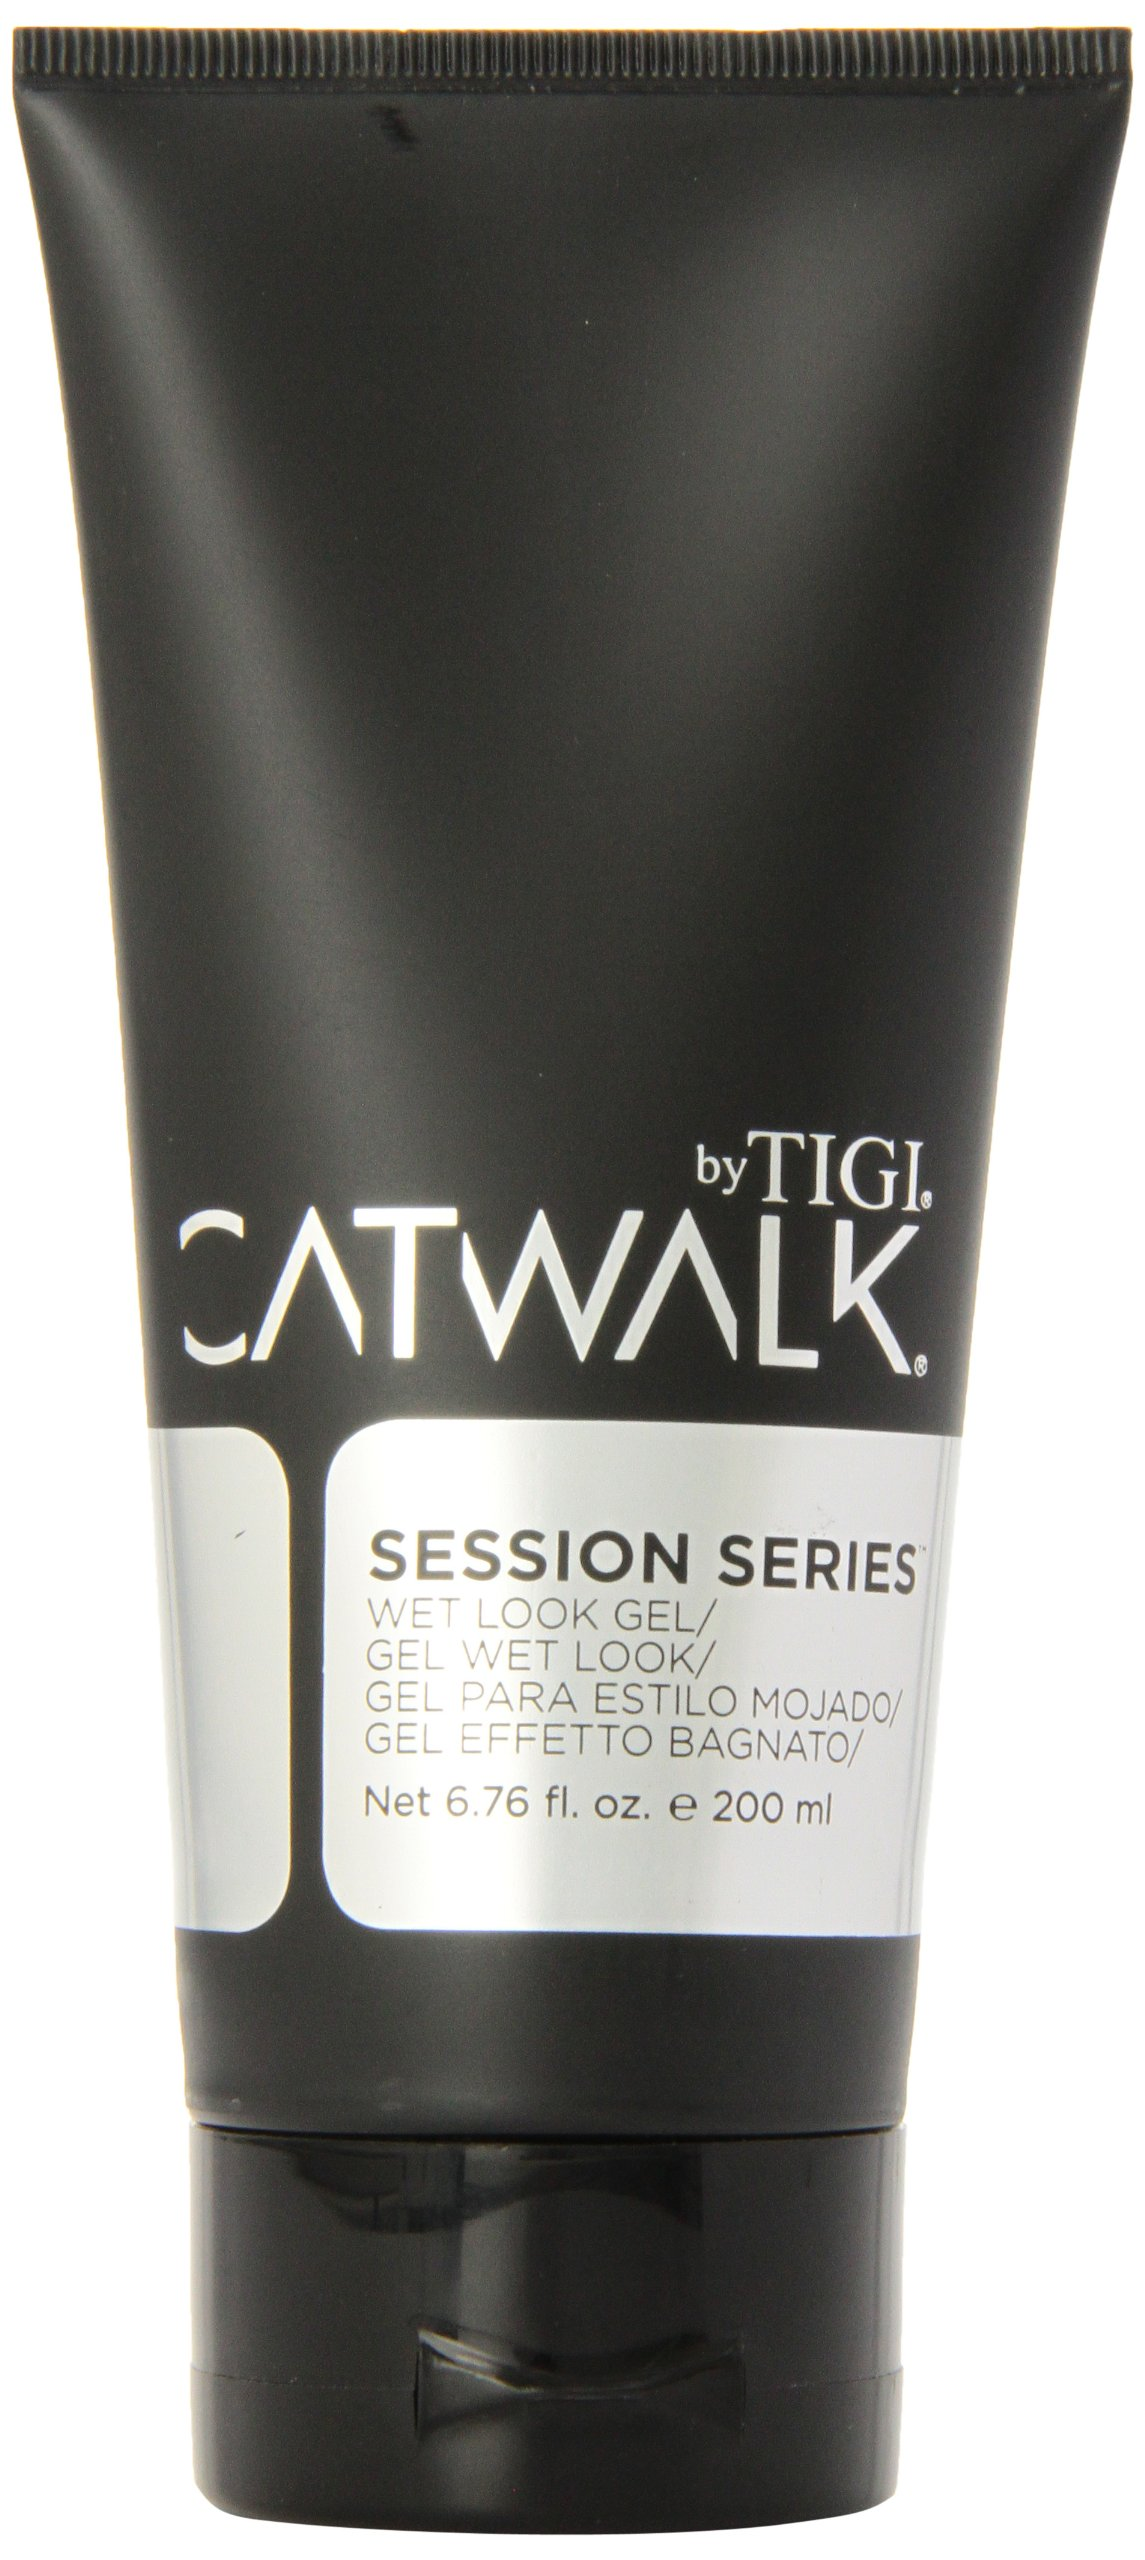 Tigi Catwalk Session Series Wet Look Gel, 6.76 Ounce